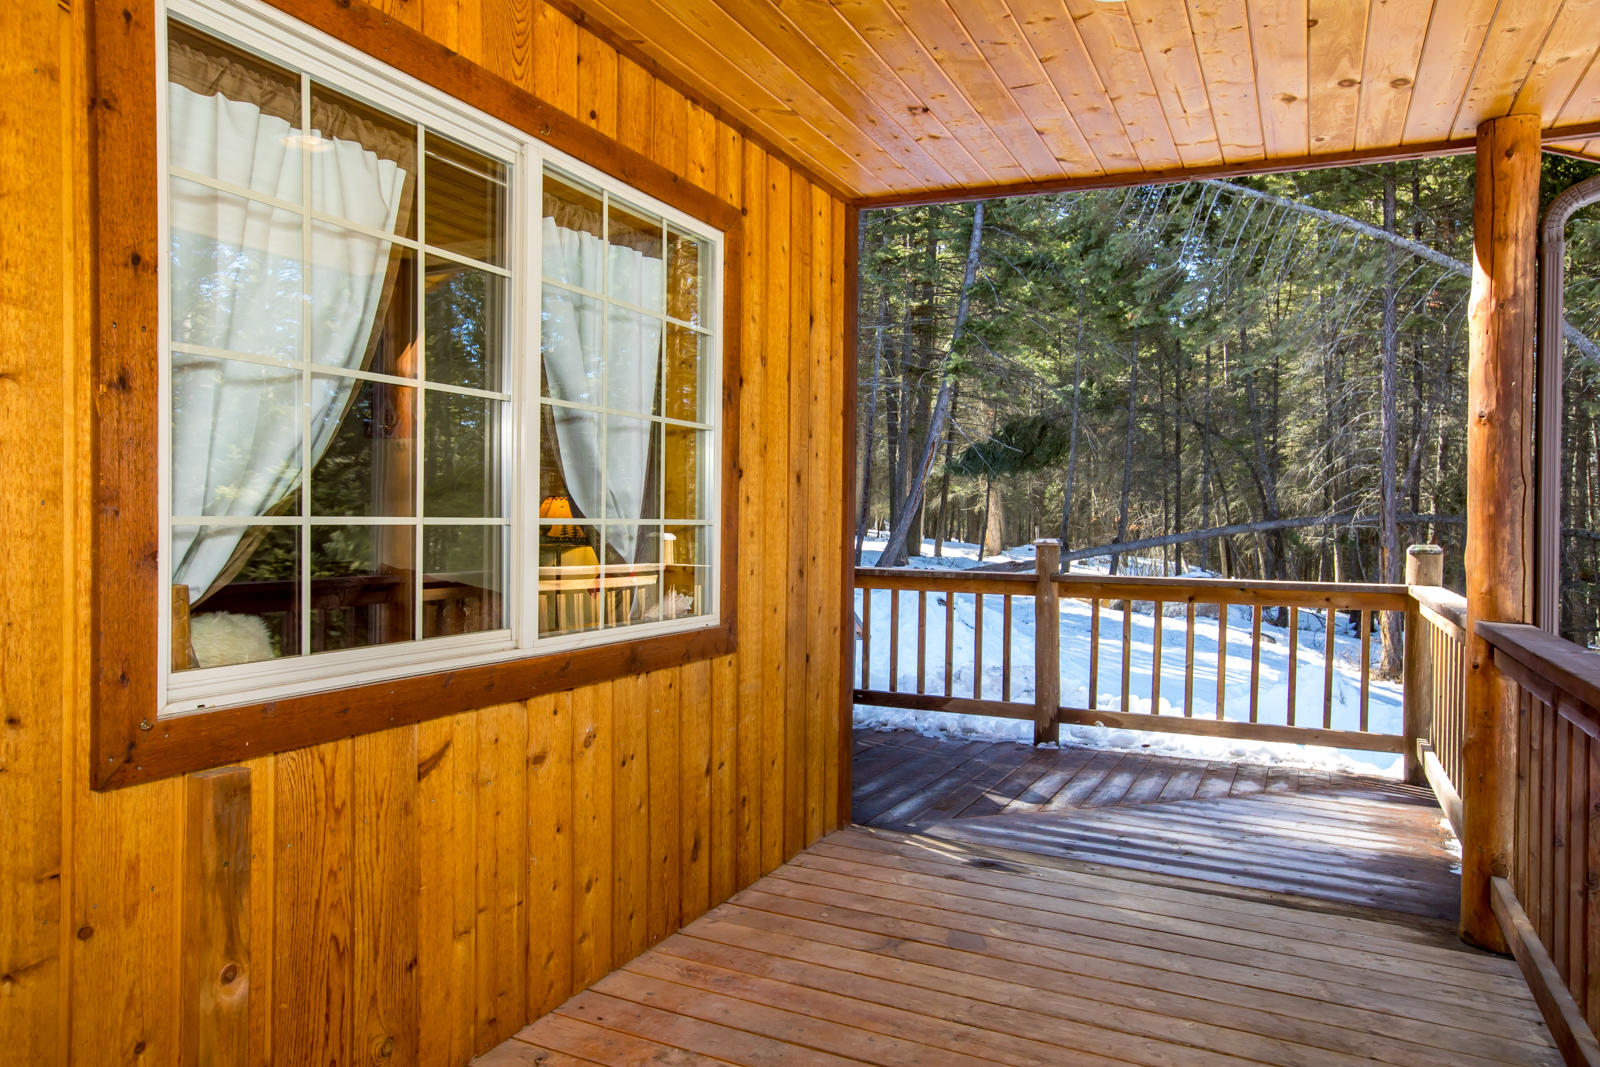 More deck views around corner to hot tub